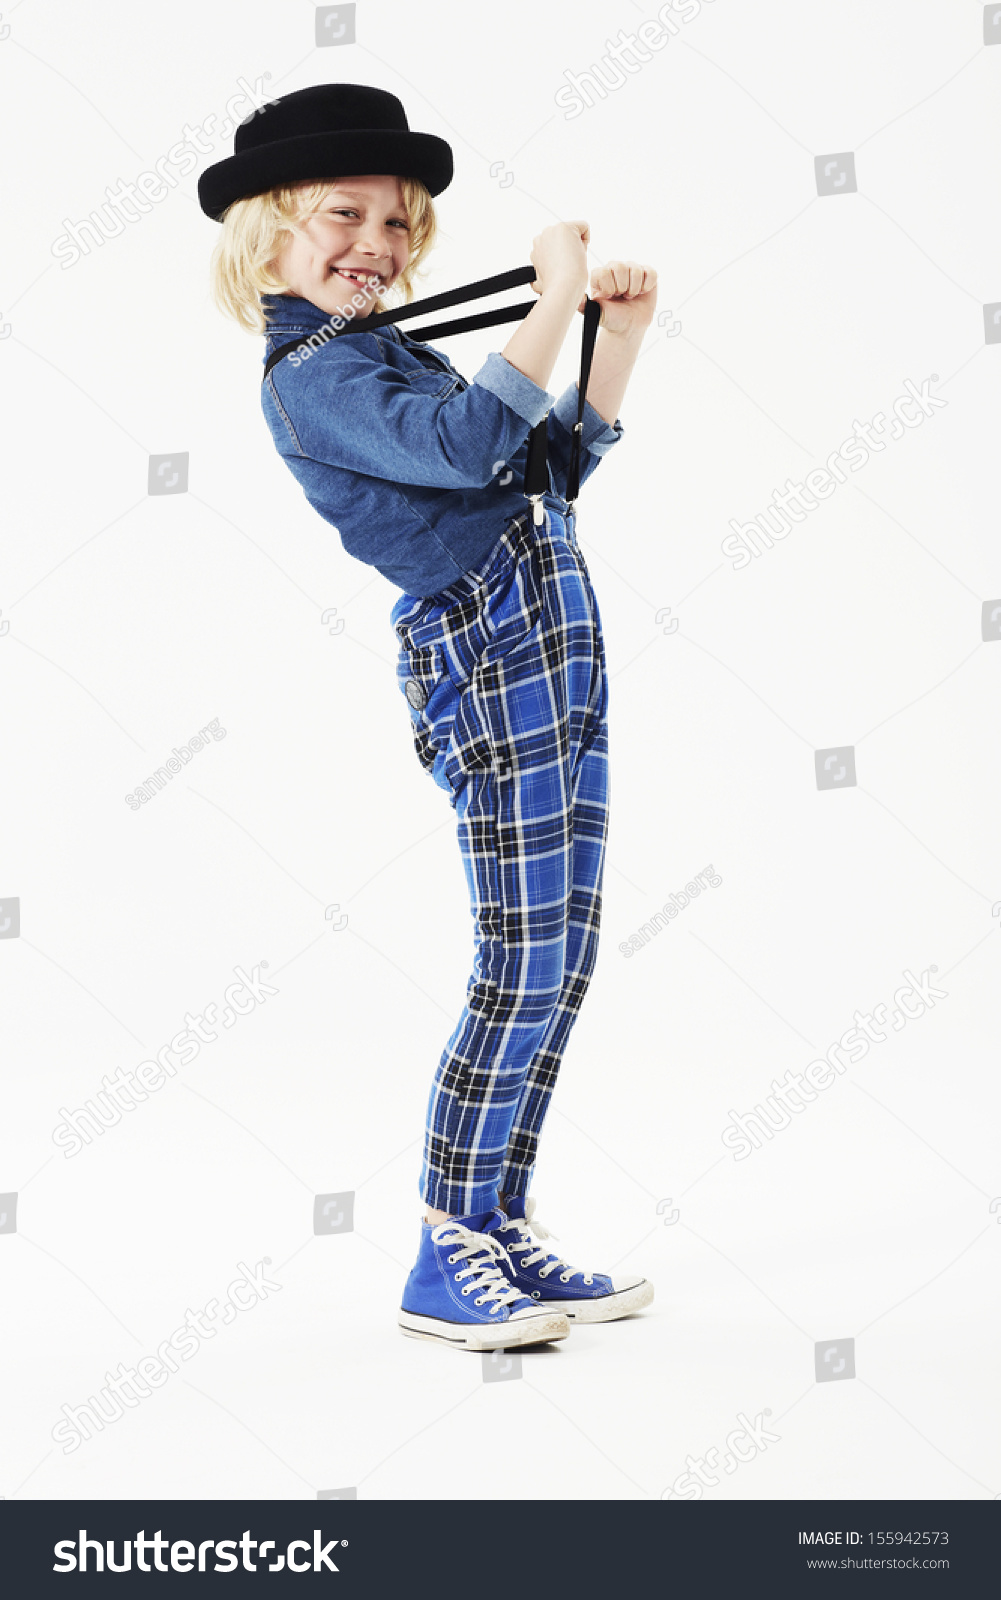 Boy Pulling Braces Studio Stock Photo 155942573 - Shutterstock